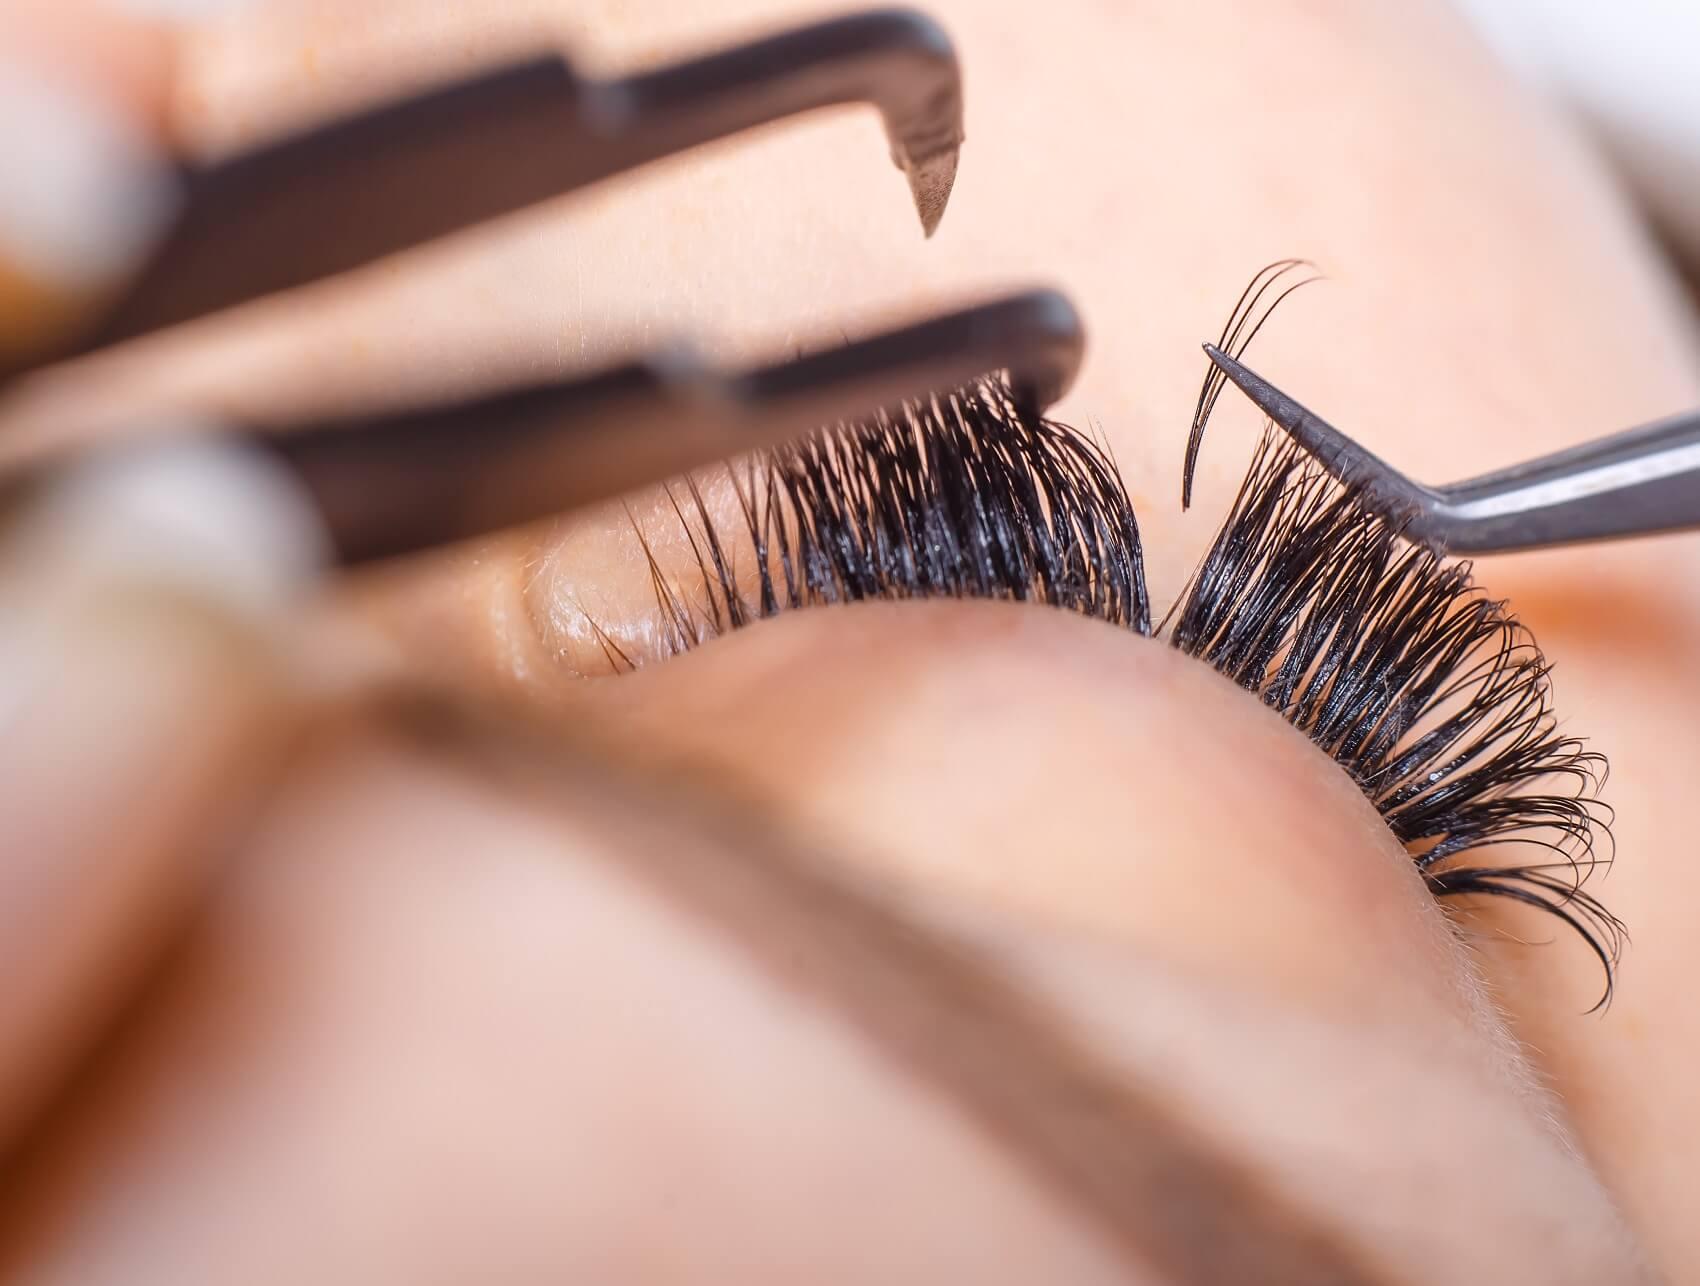 Beauty Salon Chadwell Heath - Lashes